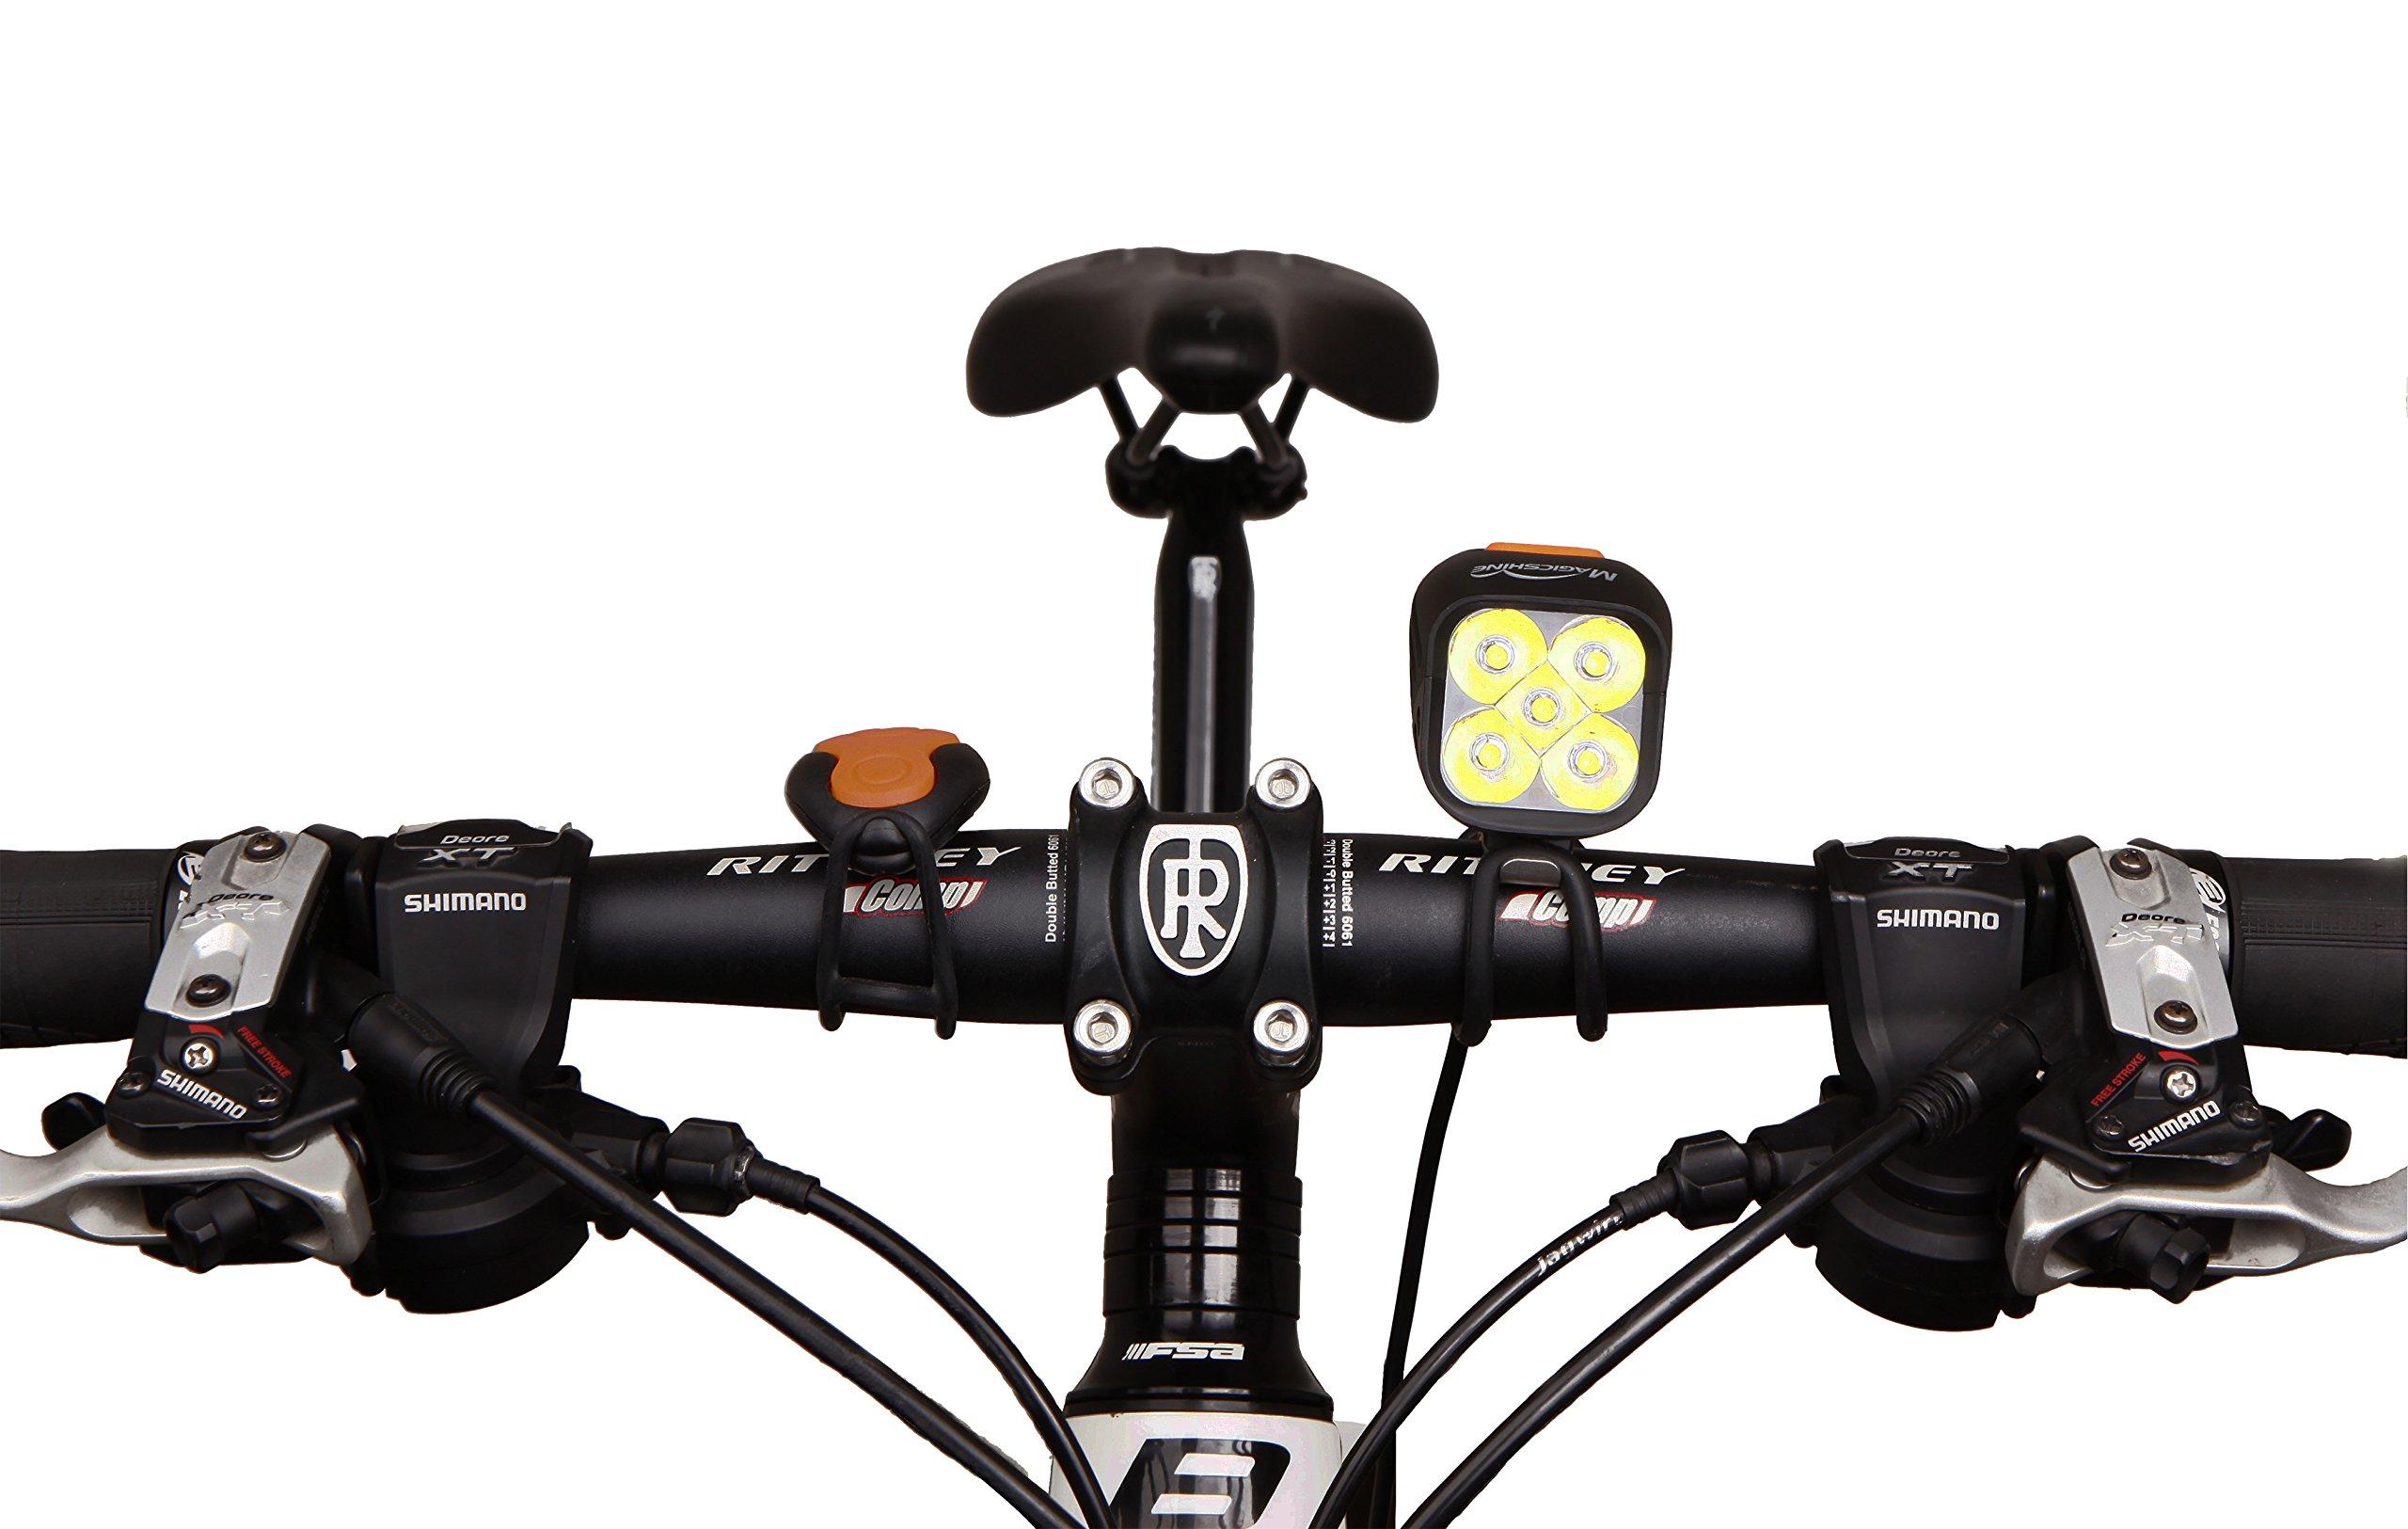 Magicshine MJ 906, High Grade MTB Enduro Bike Light Set, 5000 Lumens of Max output. Wireless Remote Bicycle Lights Front And Rear Combo, LED Bike Tail Light, Perfect Beam Pattern Bright Bike Light by Magicshine (Image #8)